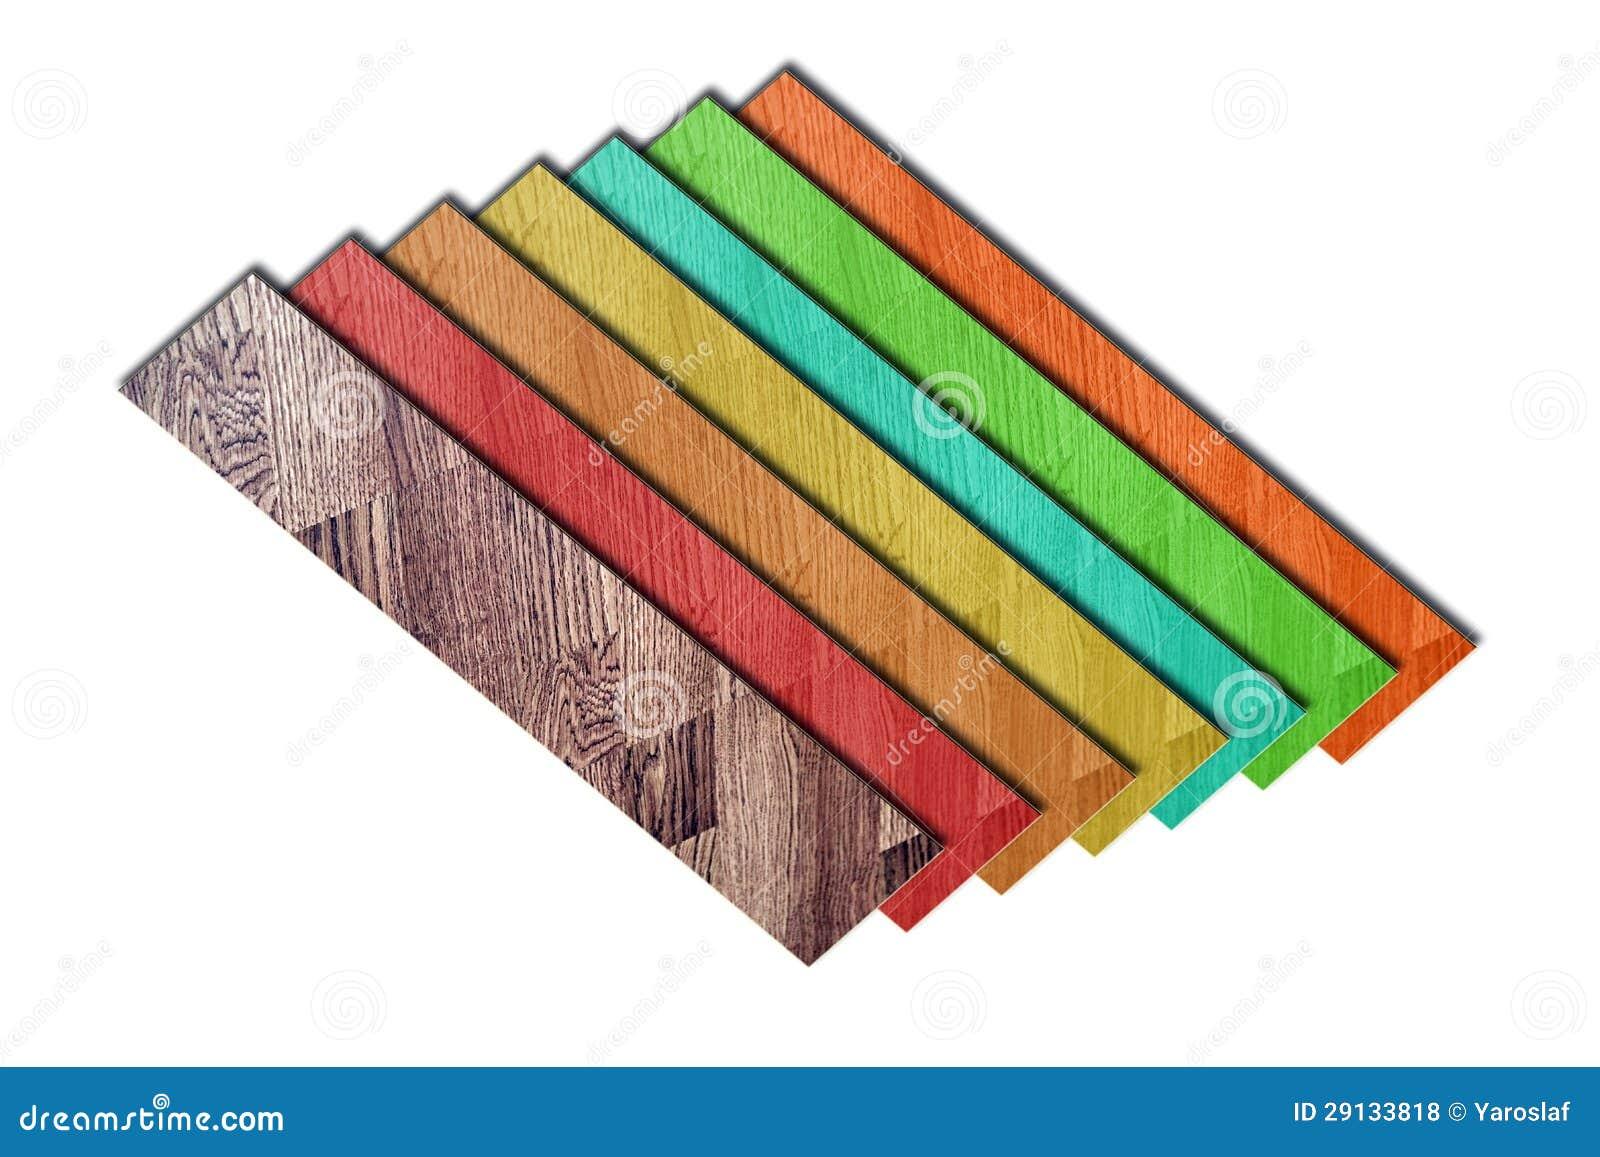 Stratifi couleur peinture antirouille - Couleur de stratifie ...